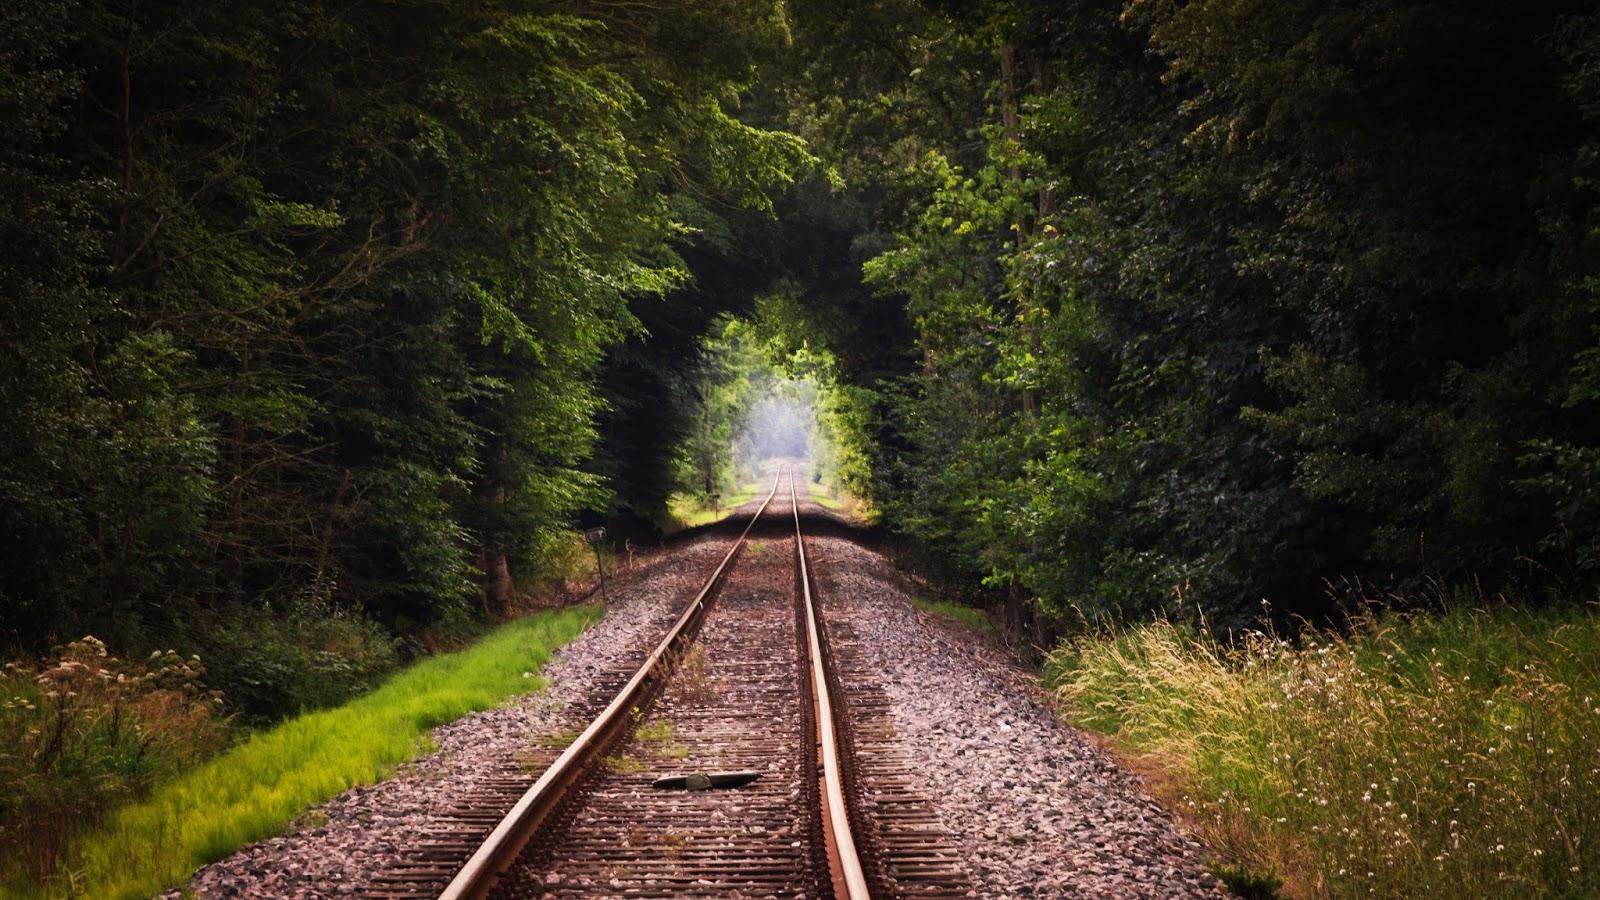 Beautiful Railway in the Nature Wallpaper